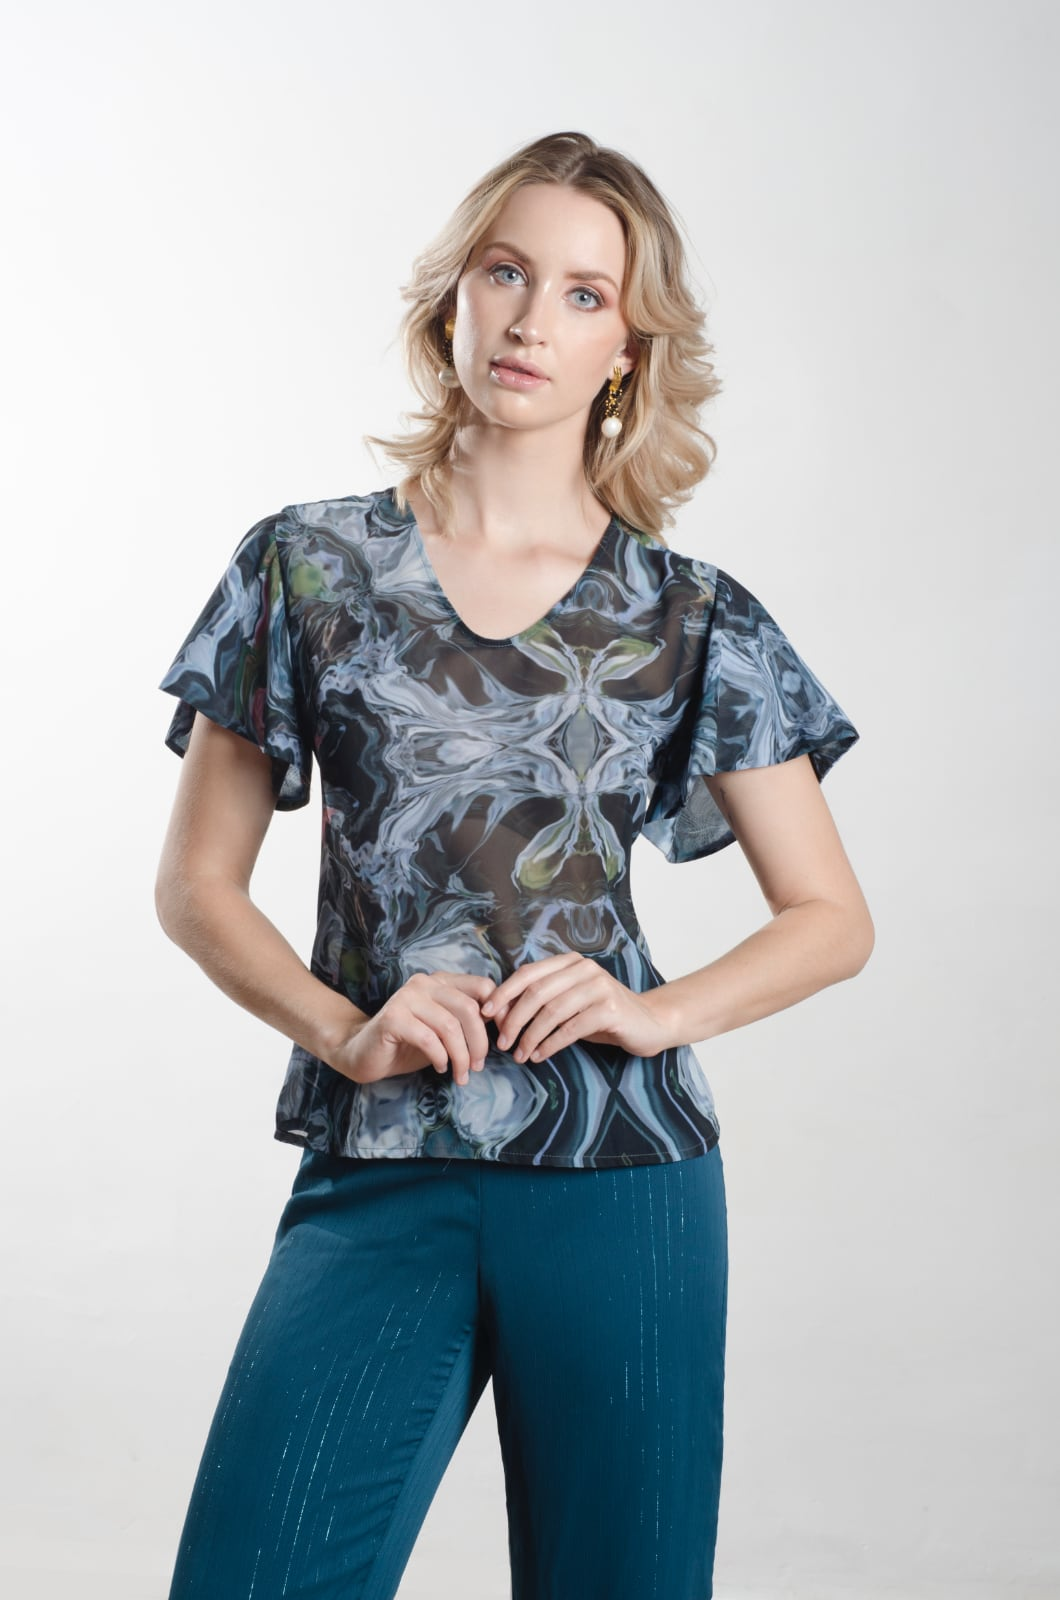 Blusa escote en v con mangas voladas - Chazari 4142-21